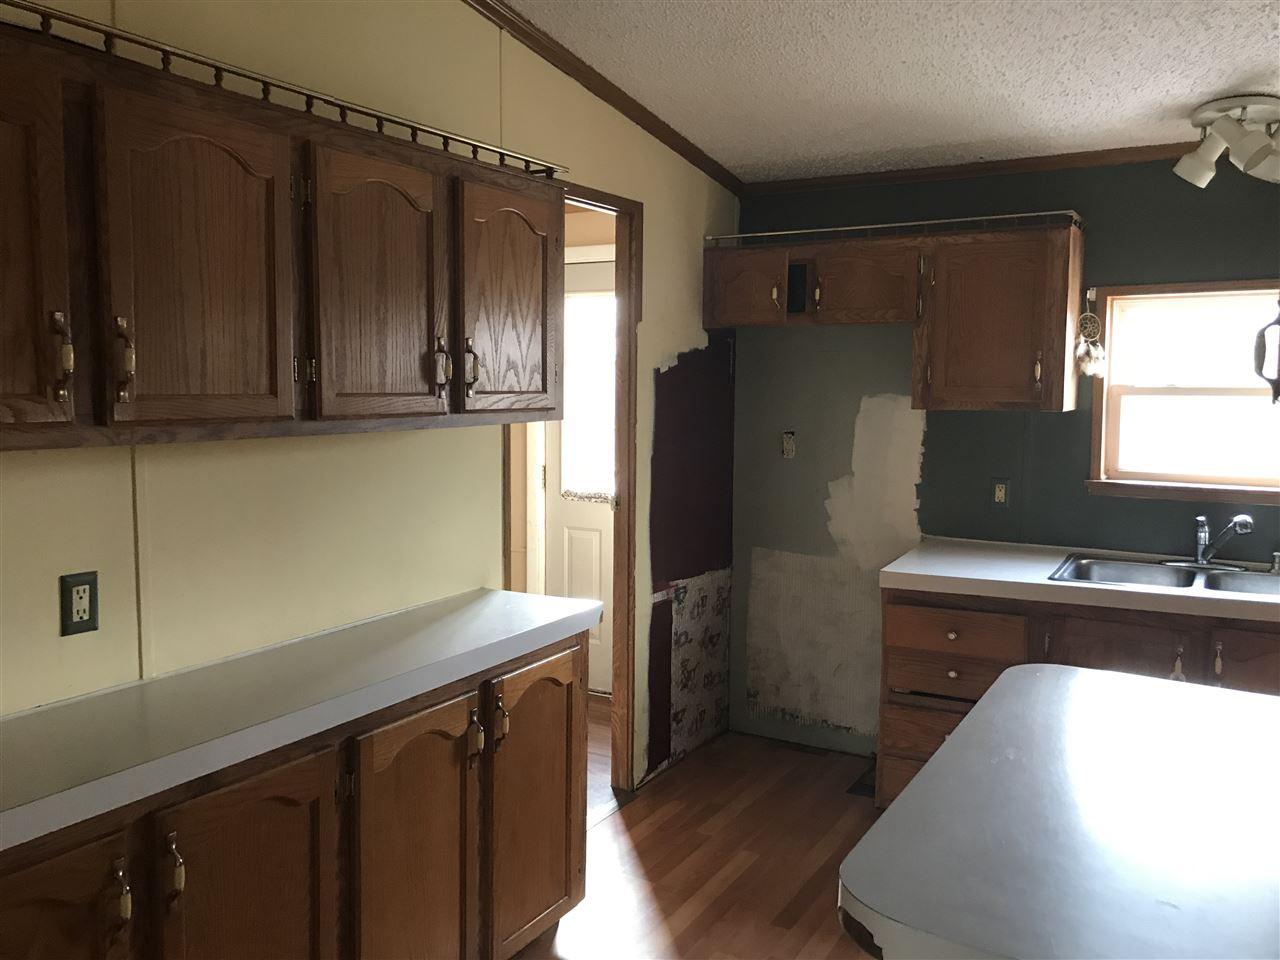 Photo 3 for 910 Alexander Rd Crittenden, KY 41030